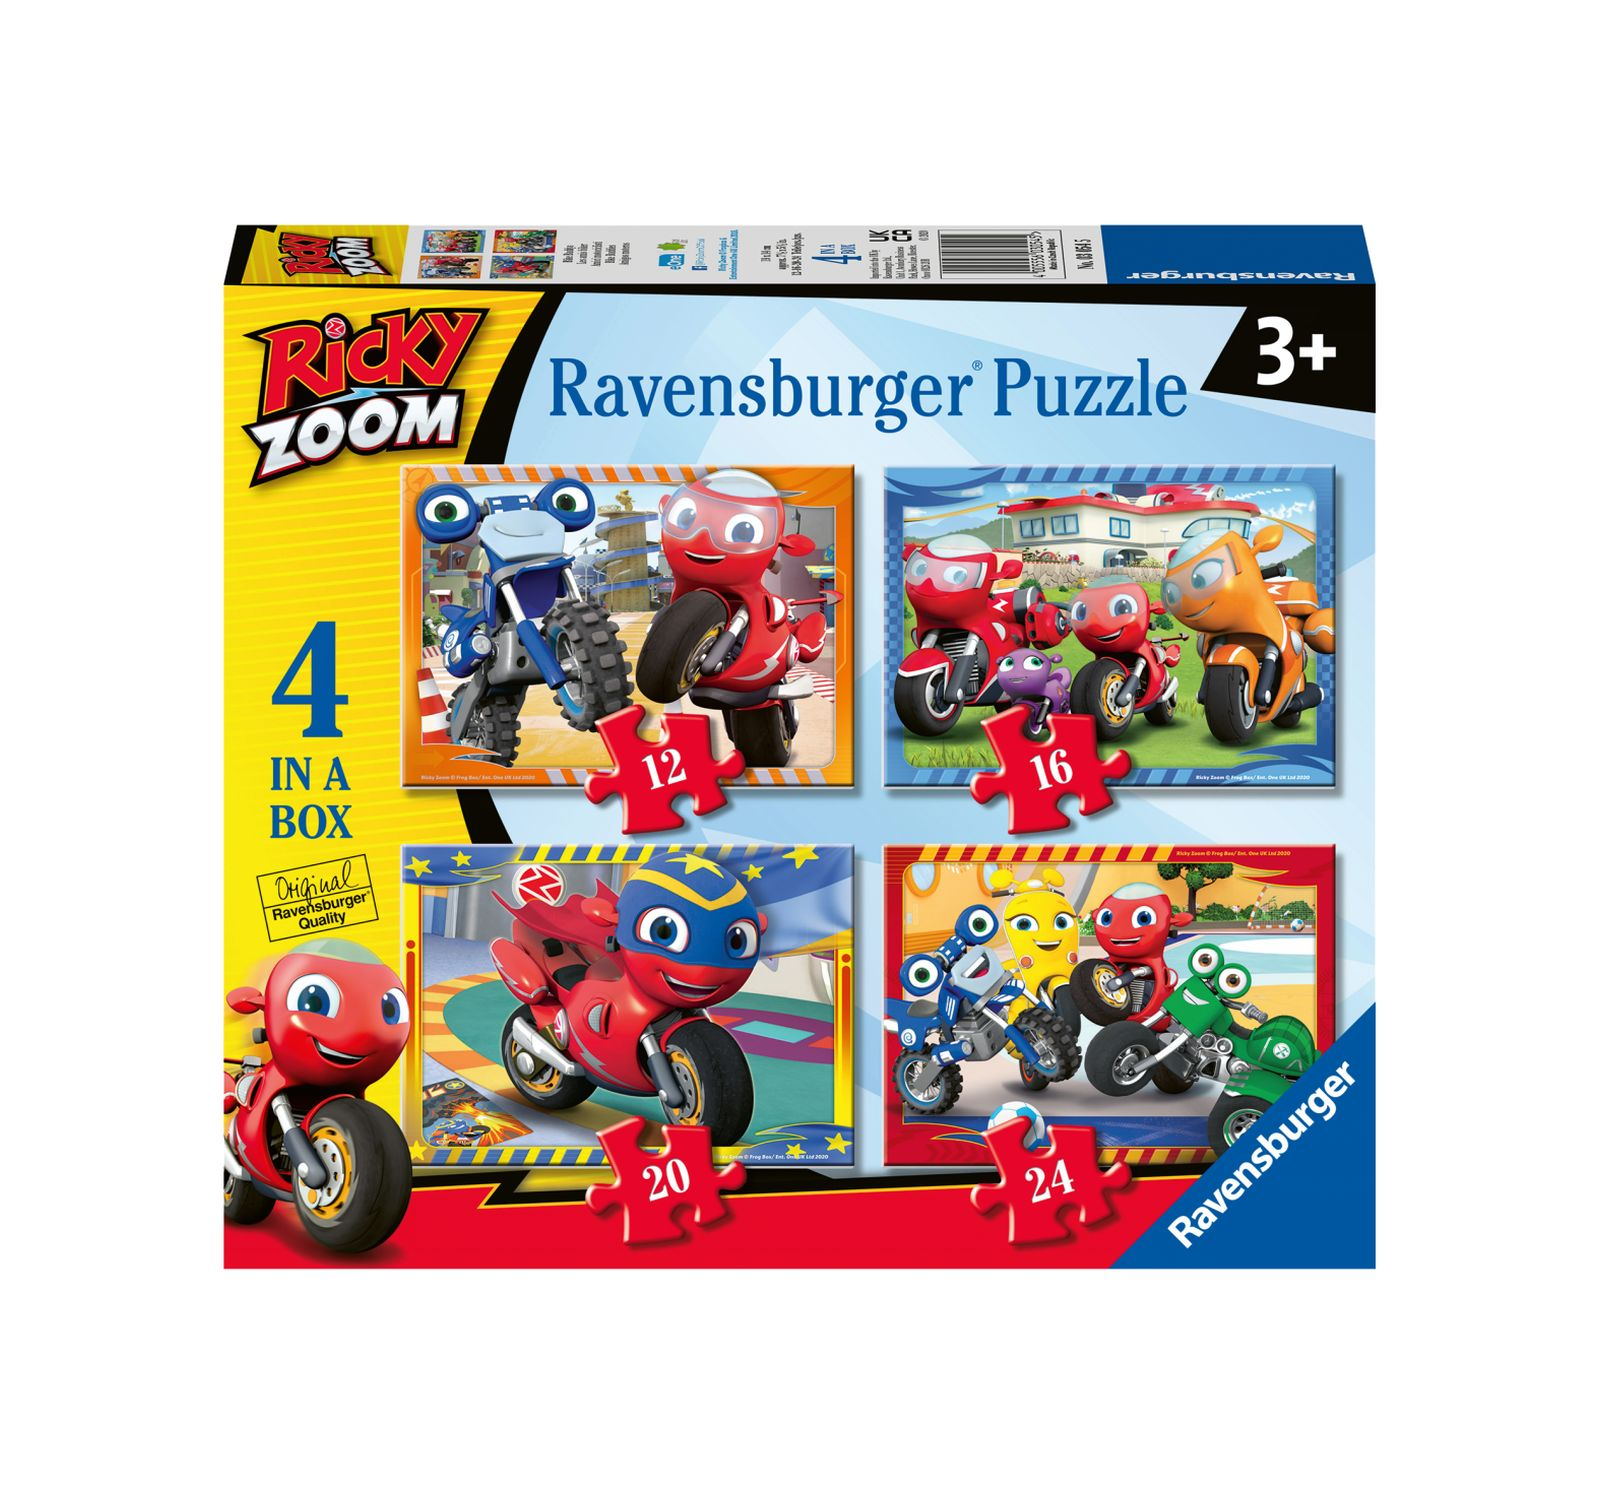 Ravensburger - 4 in a box - ricky zoom - Ravensburger1